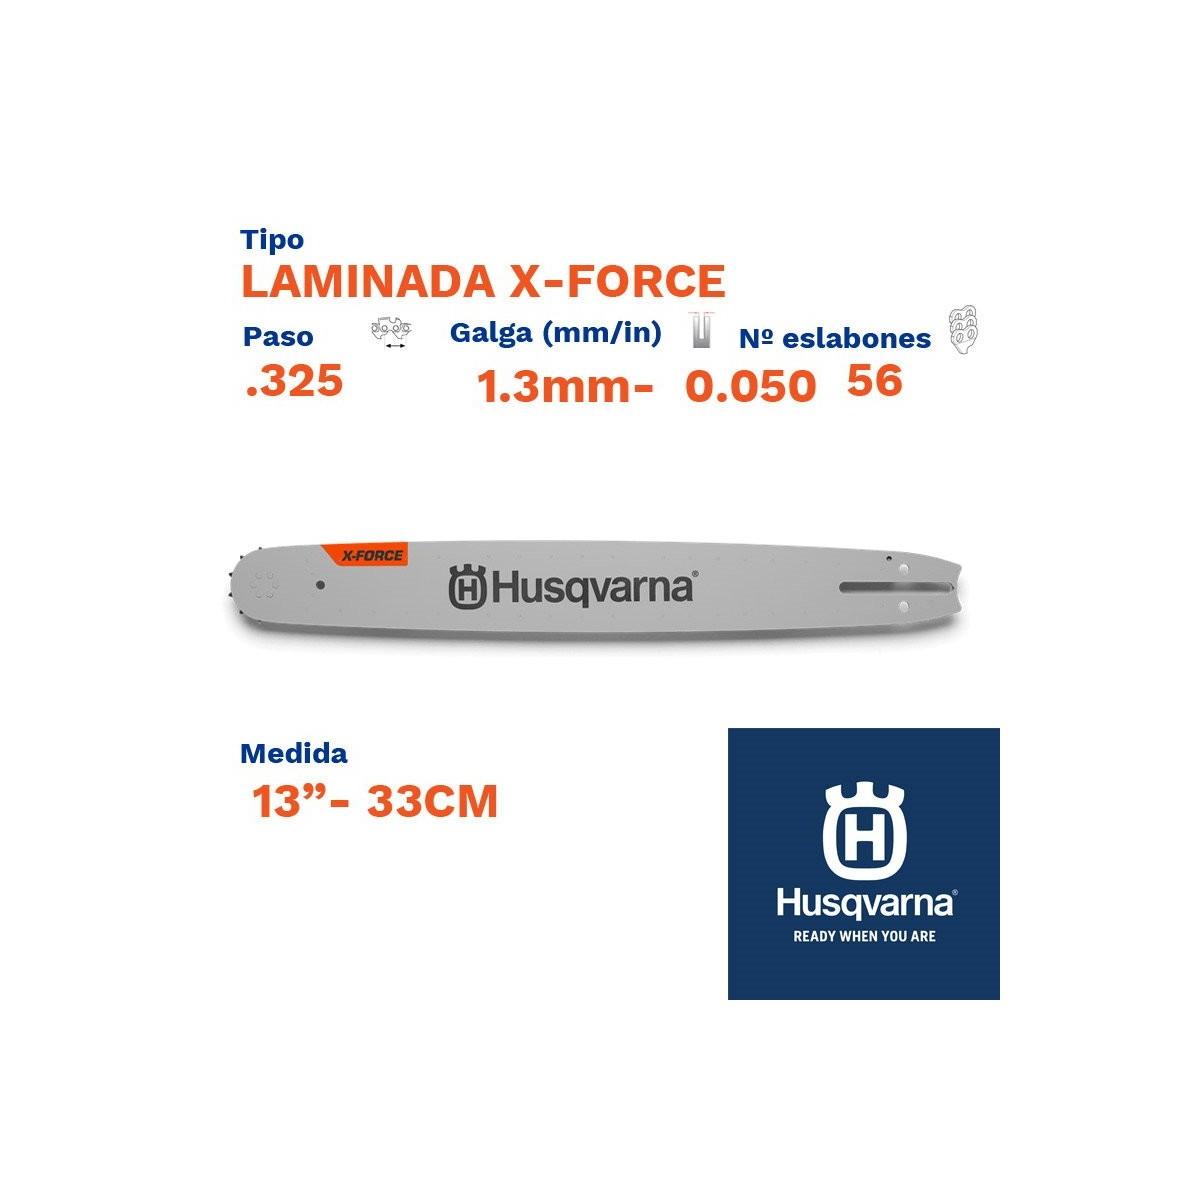 "Husqvarna espada laminada x-force 1.3mm 56  eslabones-pc .325  13""- 33cm"